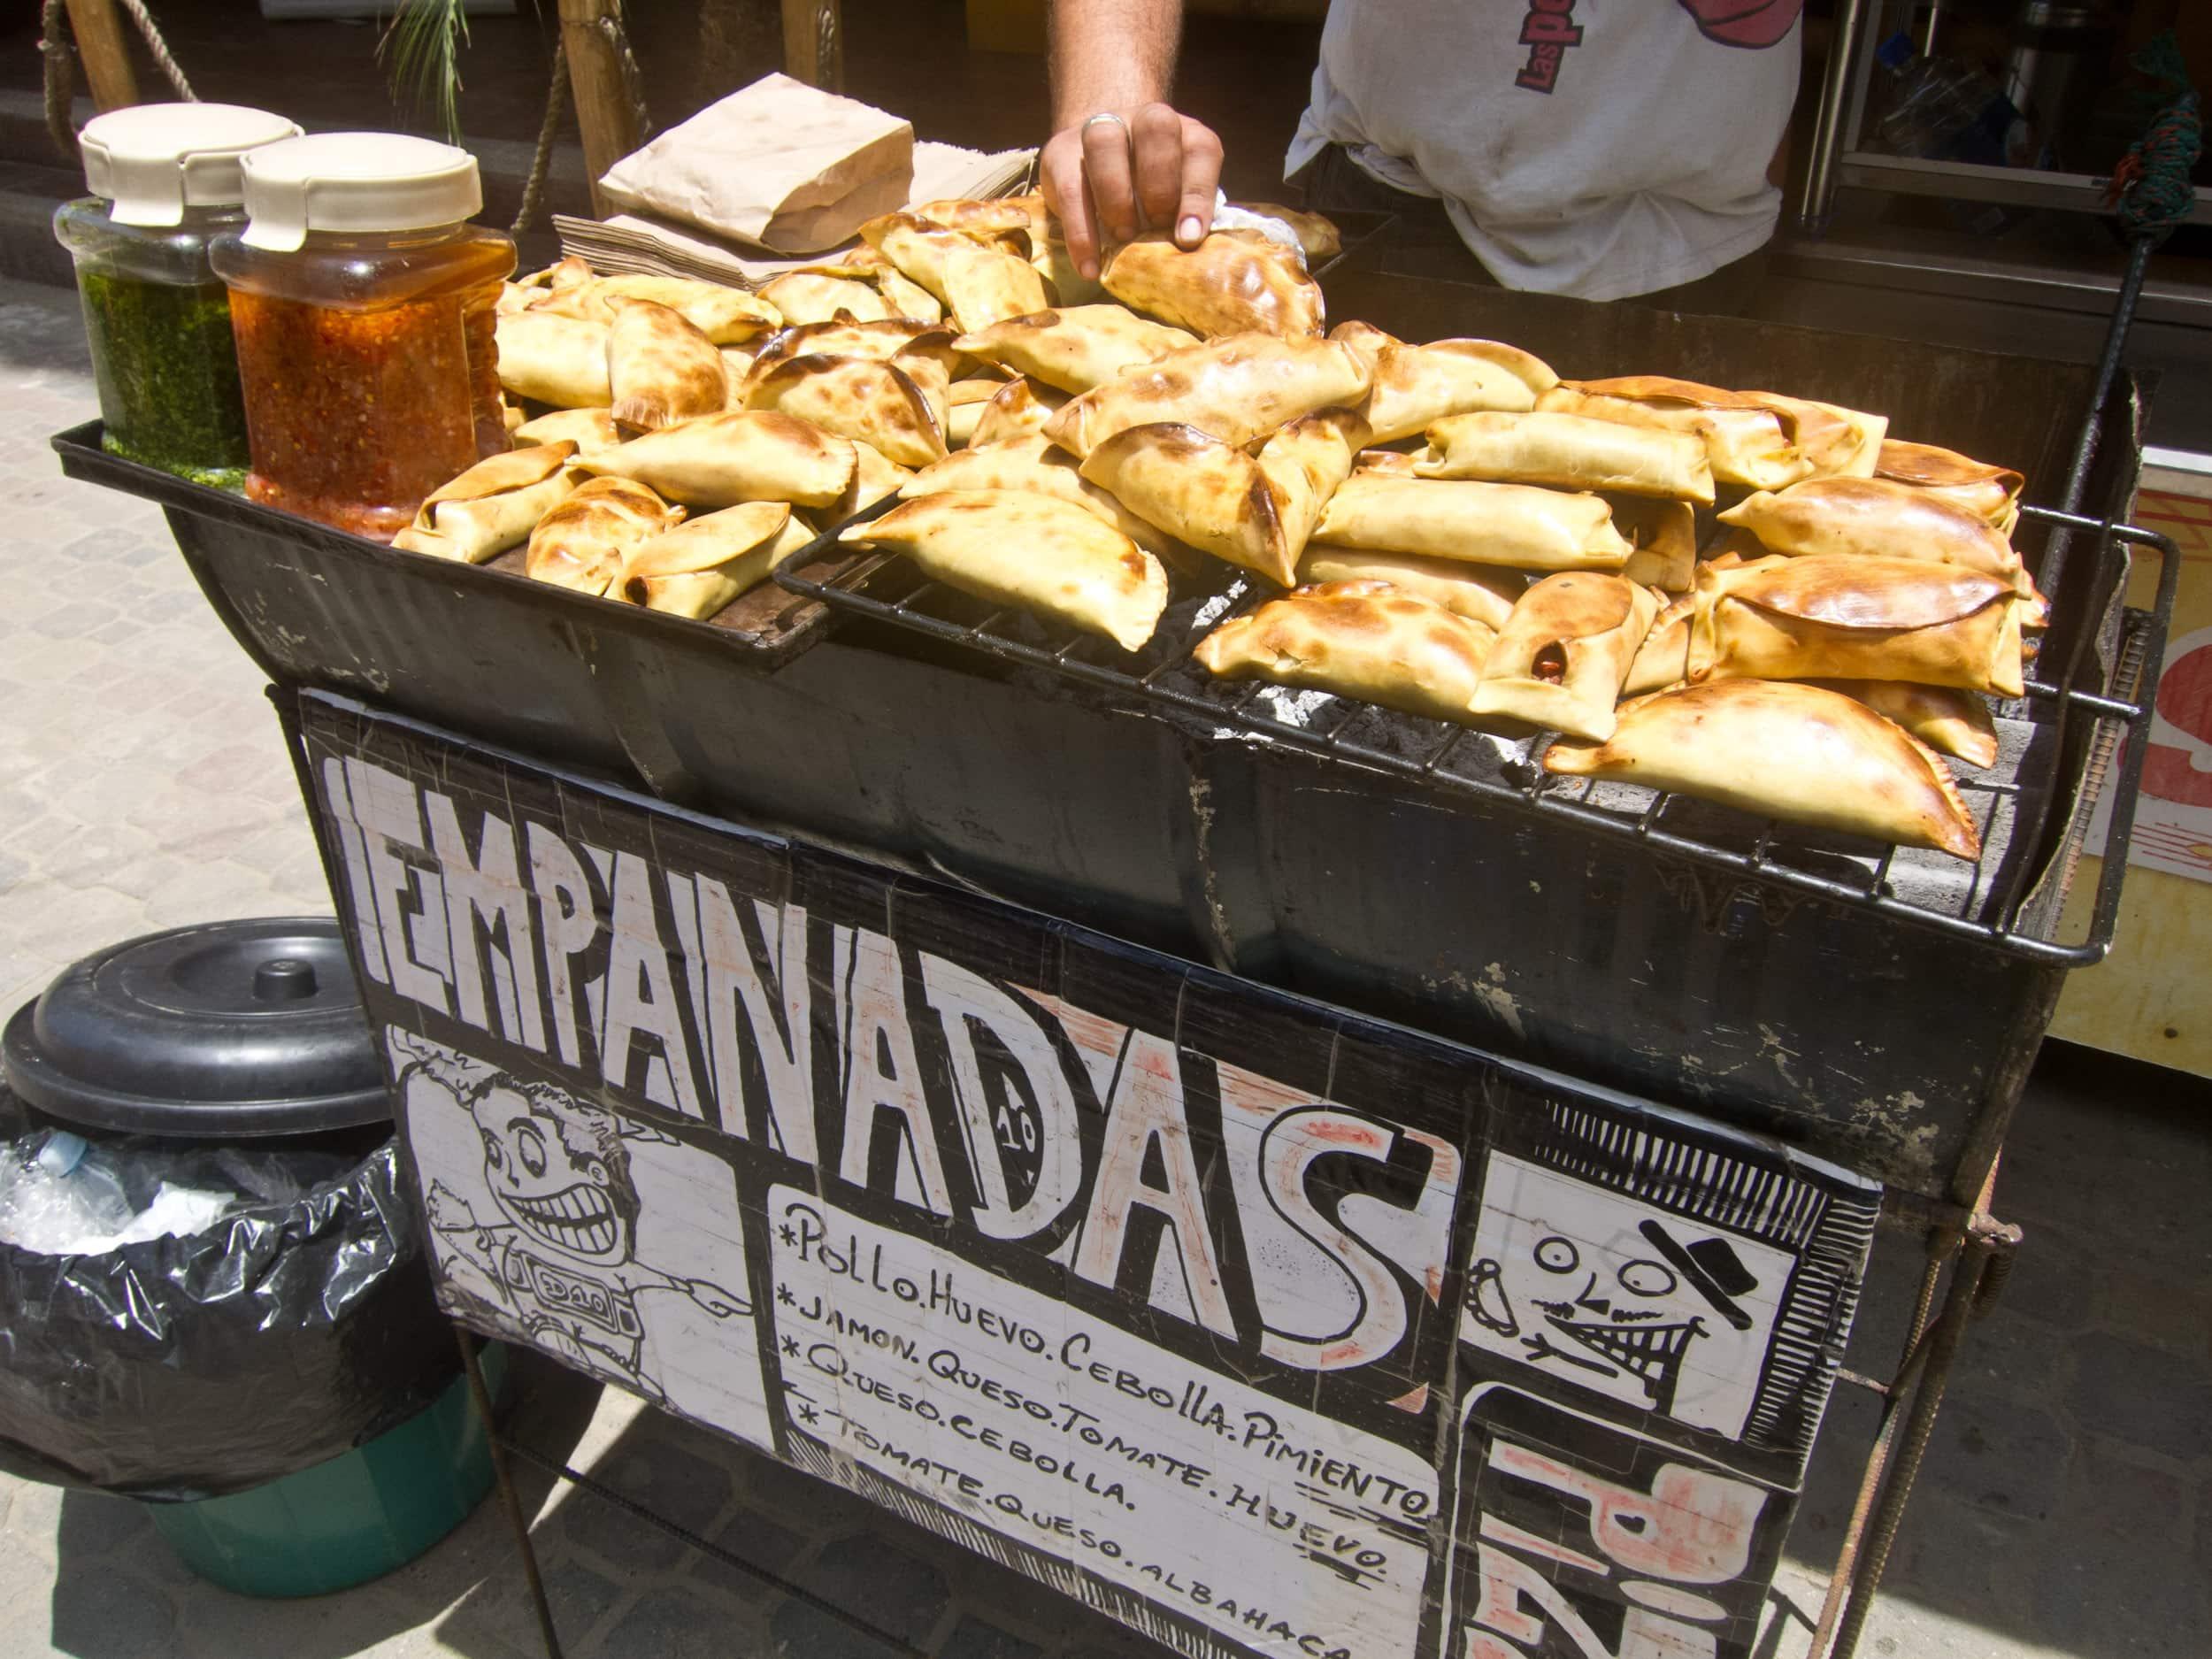 An Argentinian sells empanadas for $1 apiece on the street